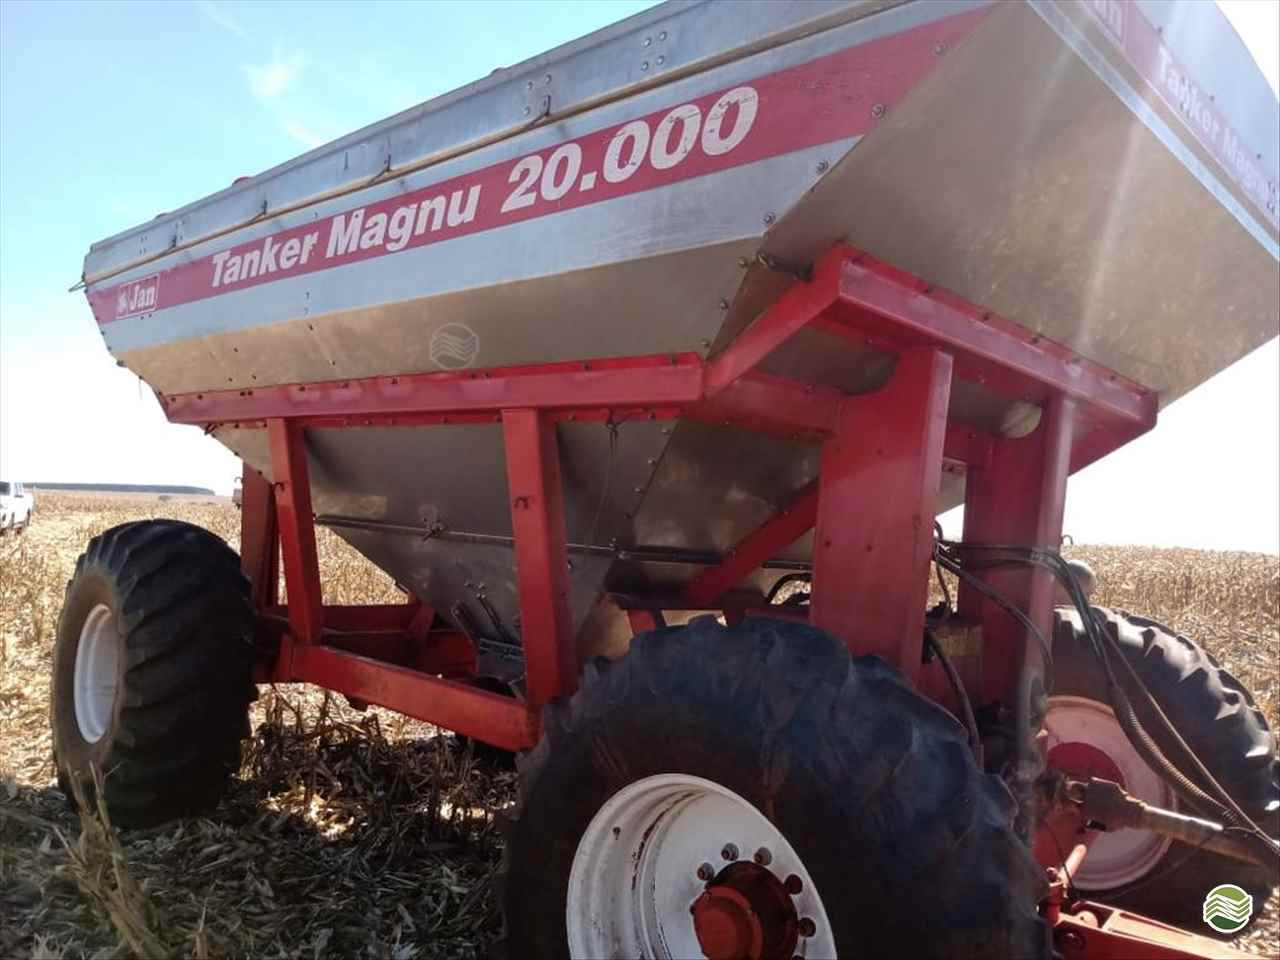 IMPLEMENTOS AGRICOLAS CARRETA BAZUKA GRANELEIRA 20000 Rural Vendas TERRA ROXA PARANÁ PR